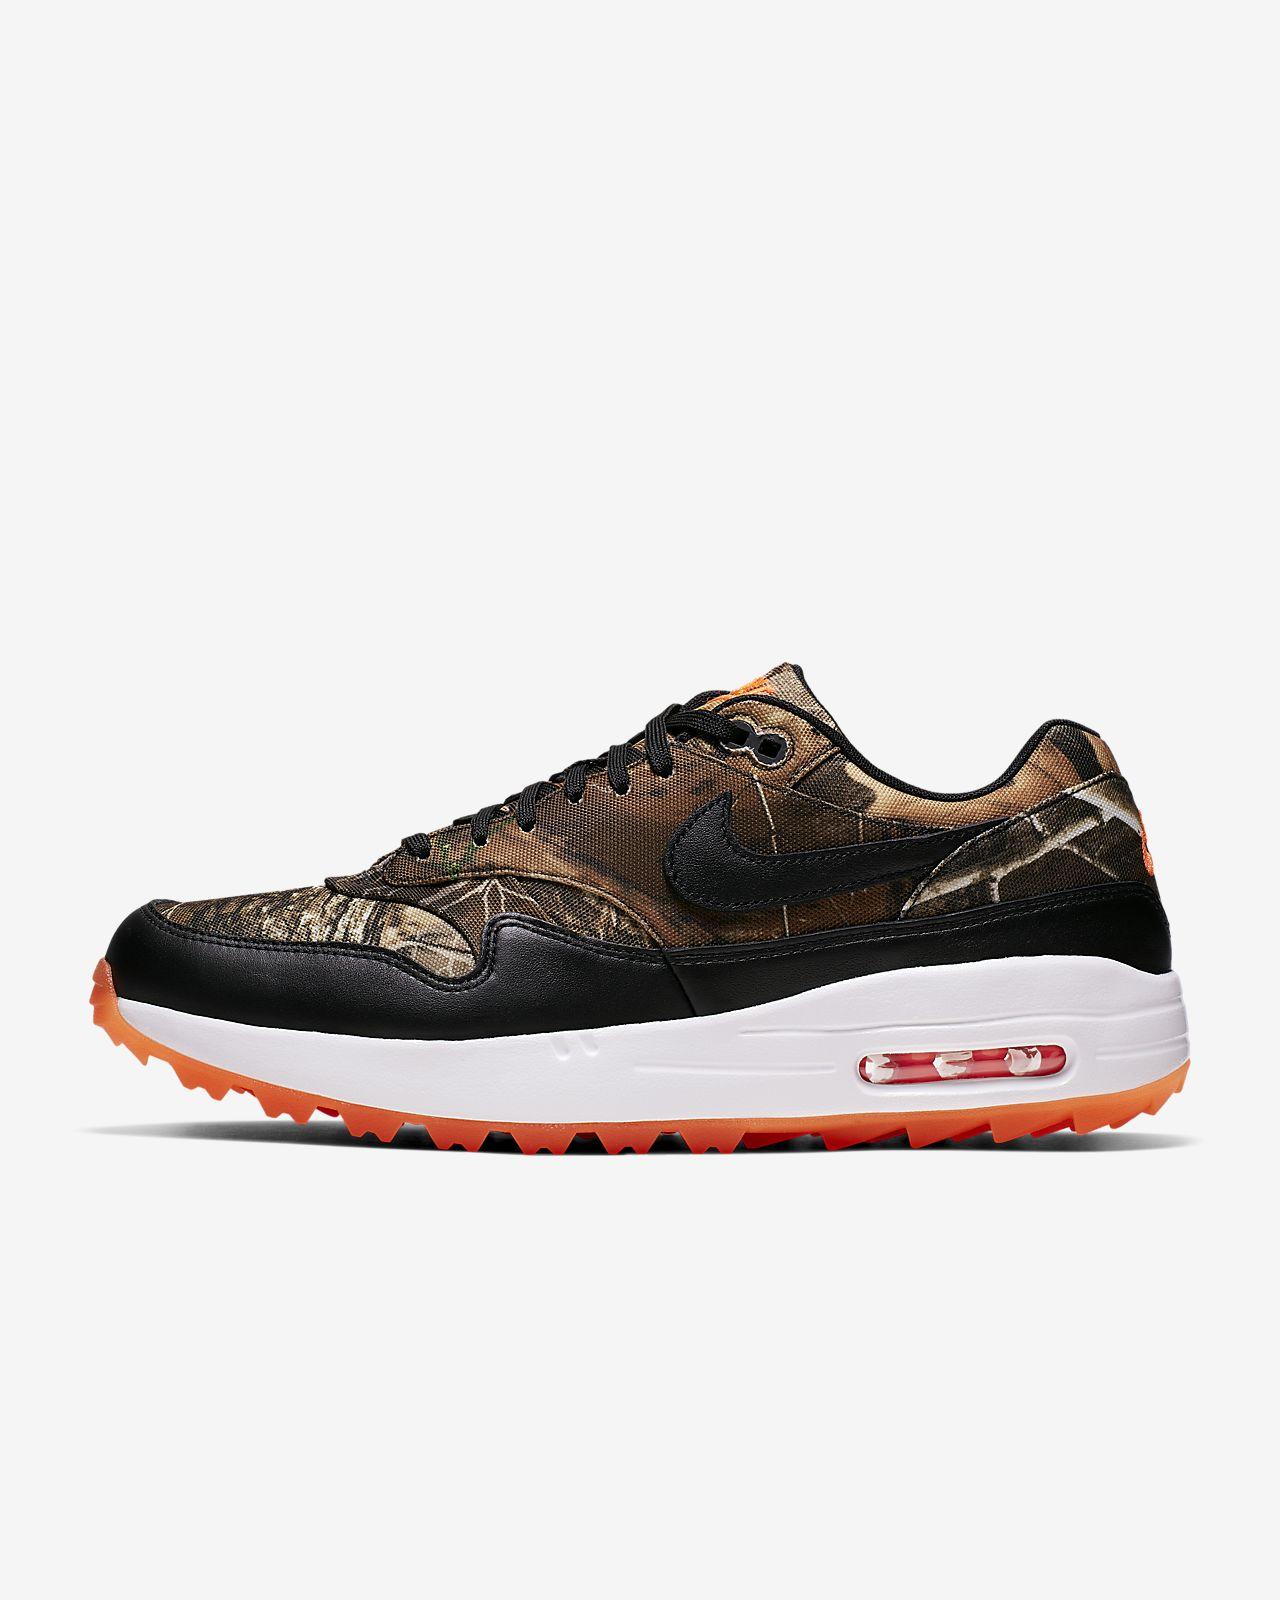 Scarpa da golf Nike Air Max 1 G RealtreeⓇ - Uomo